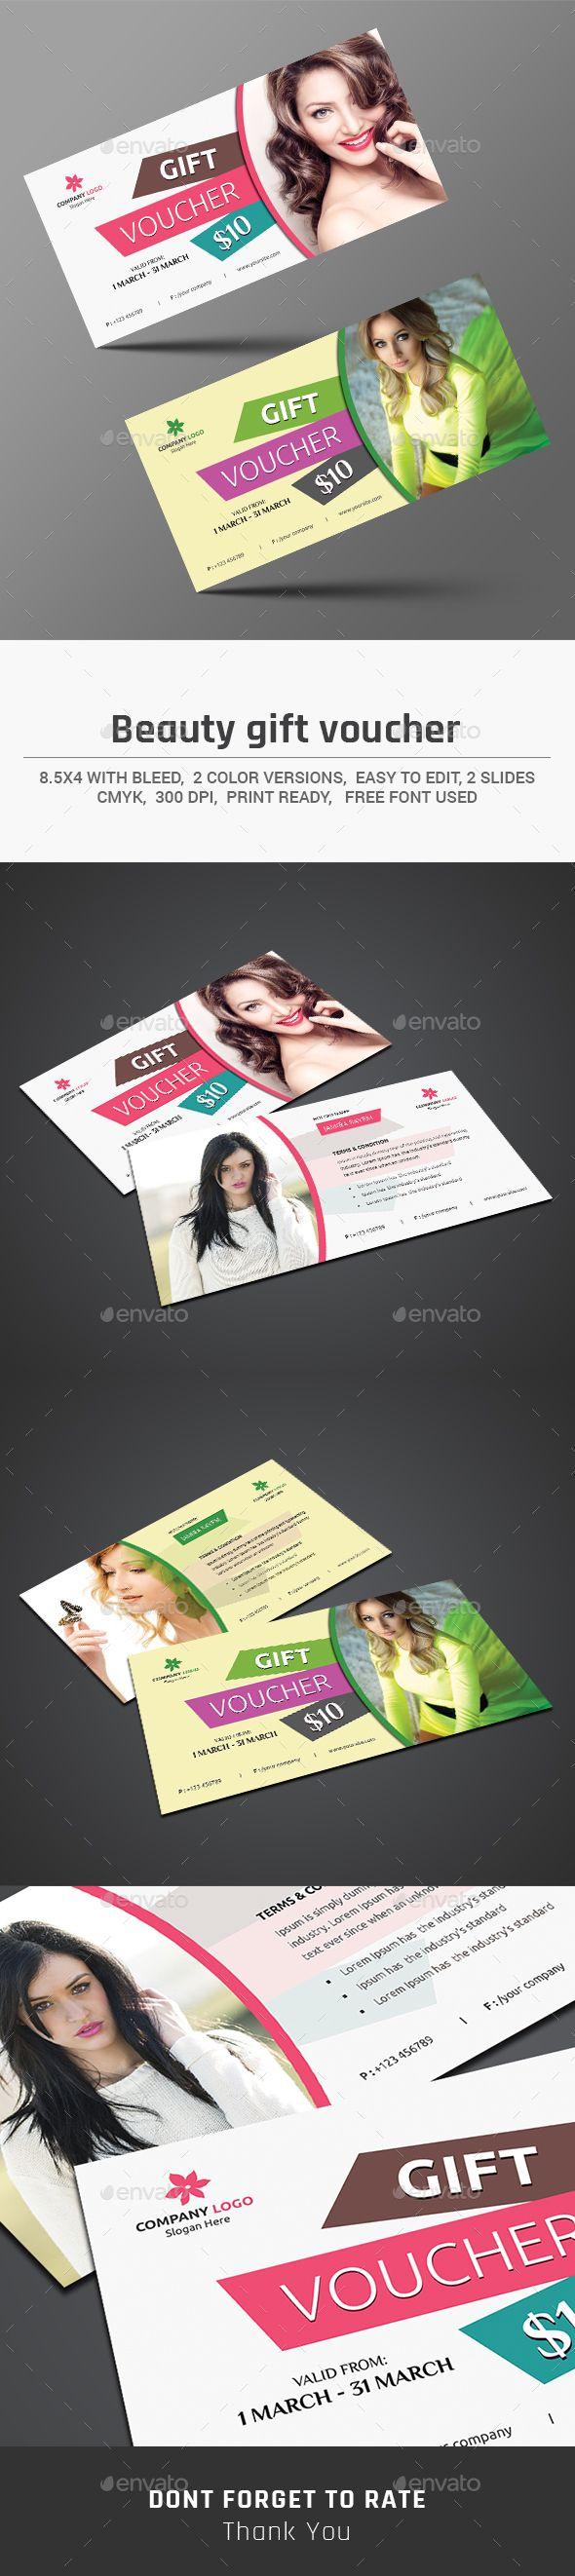 #Gift #Voucher - #Cards & #Invites Print Templates Download here: https://graphicriver.net/item/gift-voucher/13311266?ref=alena994